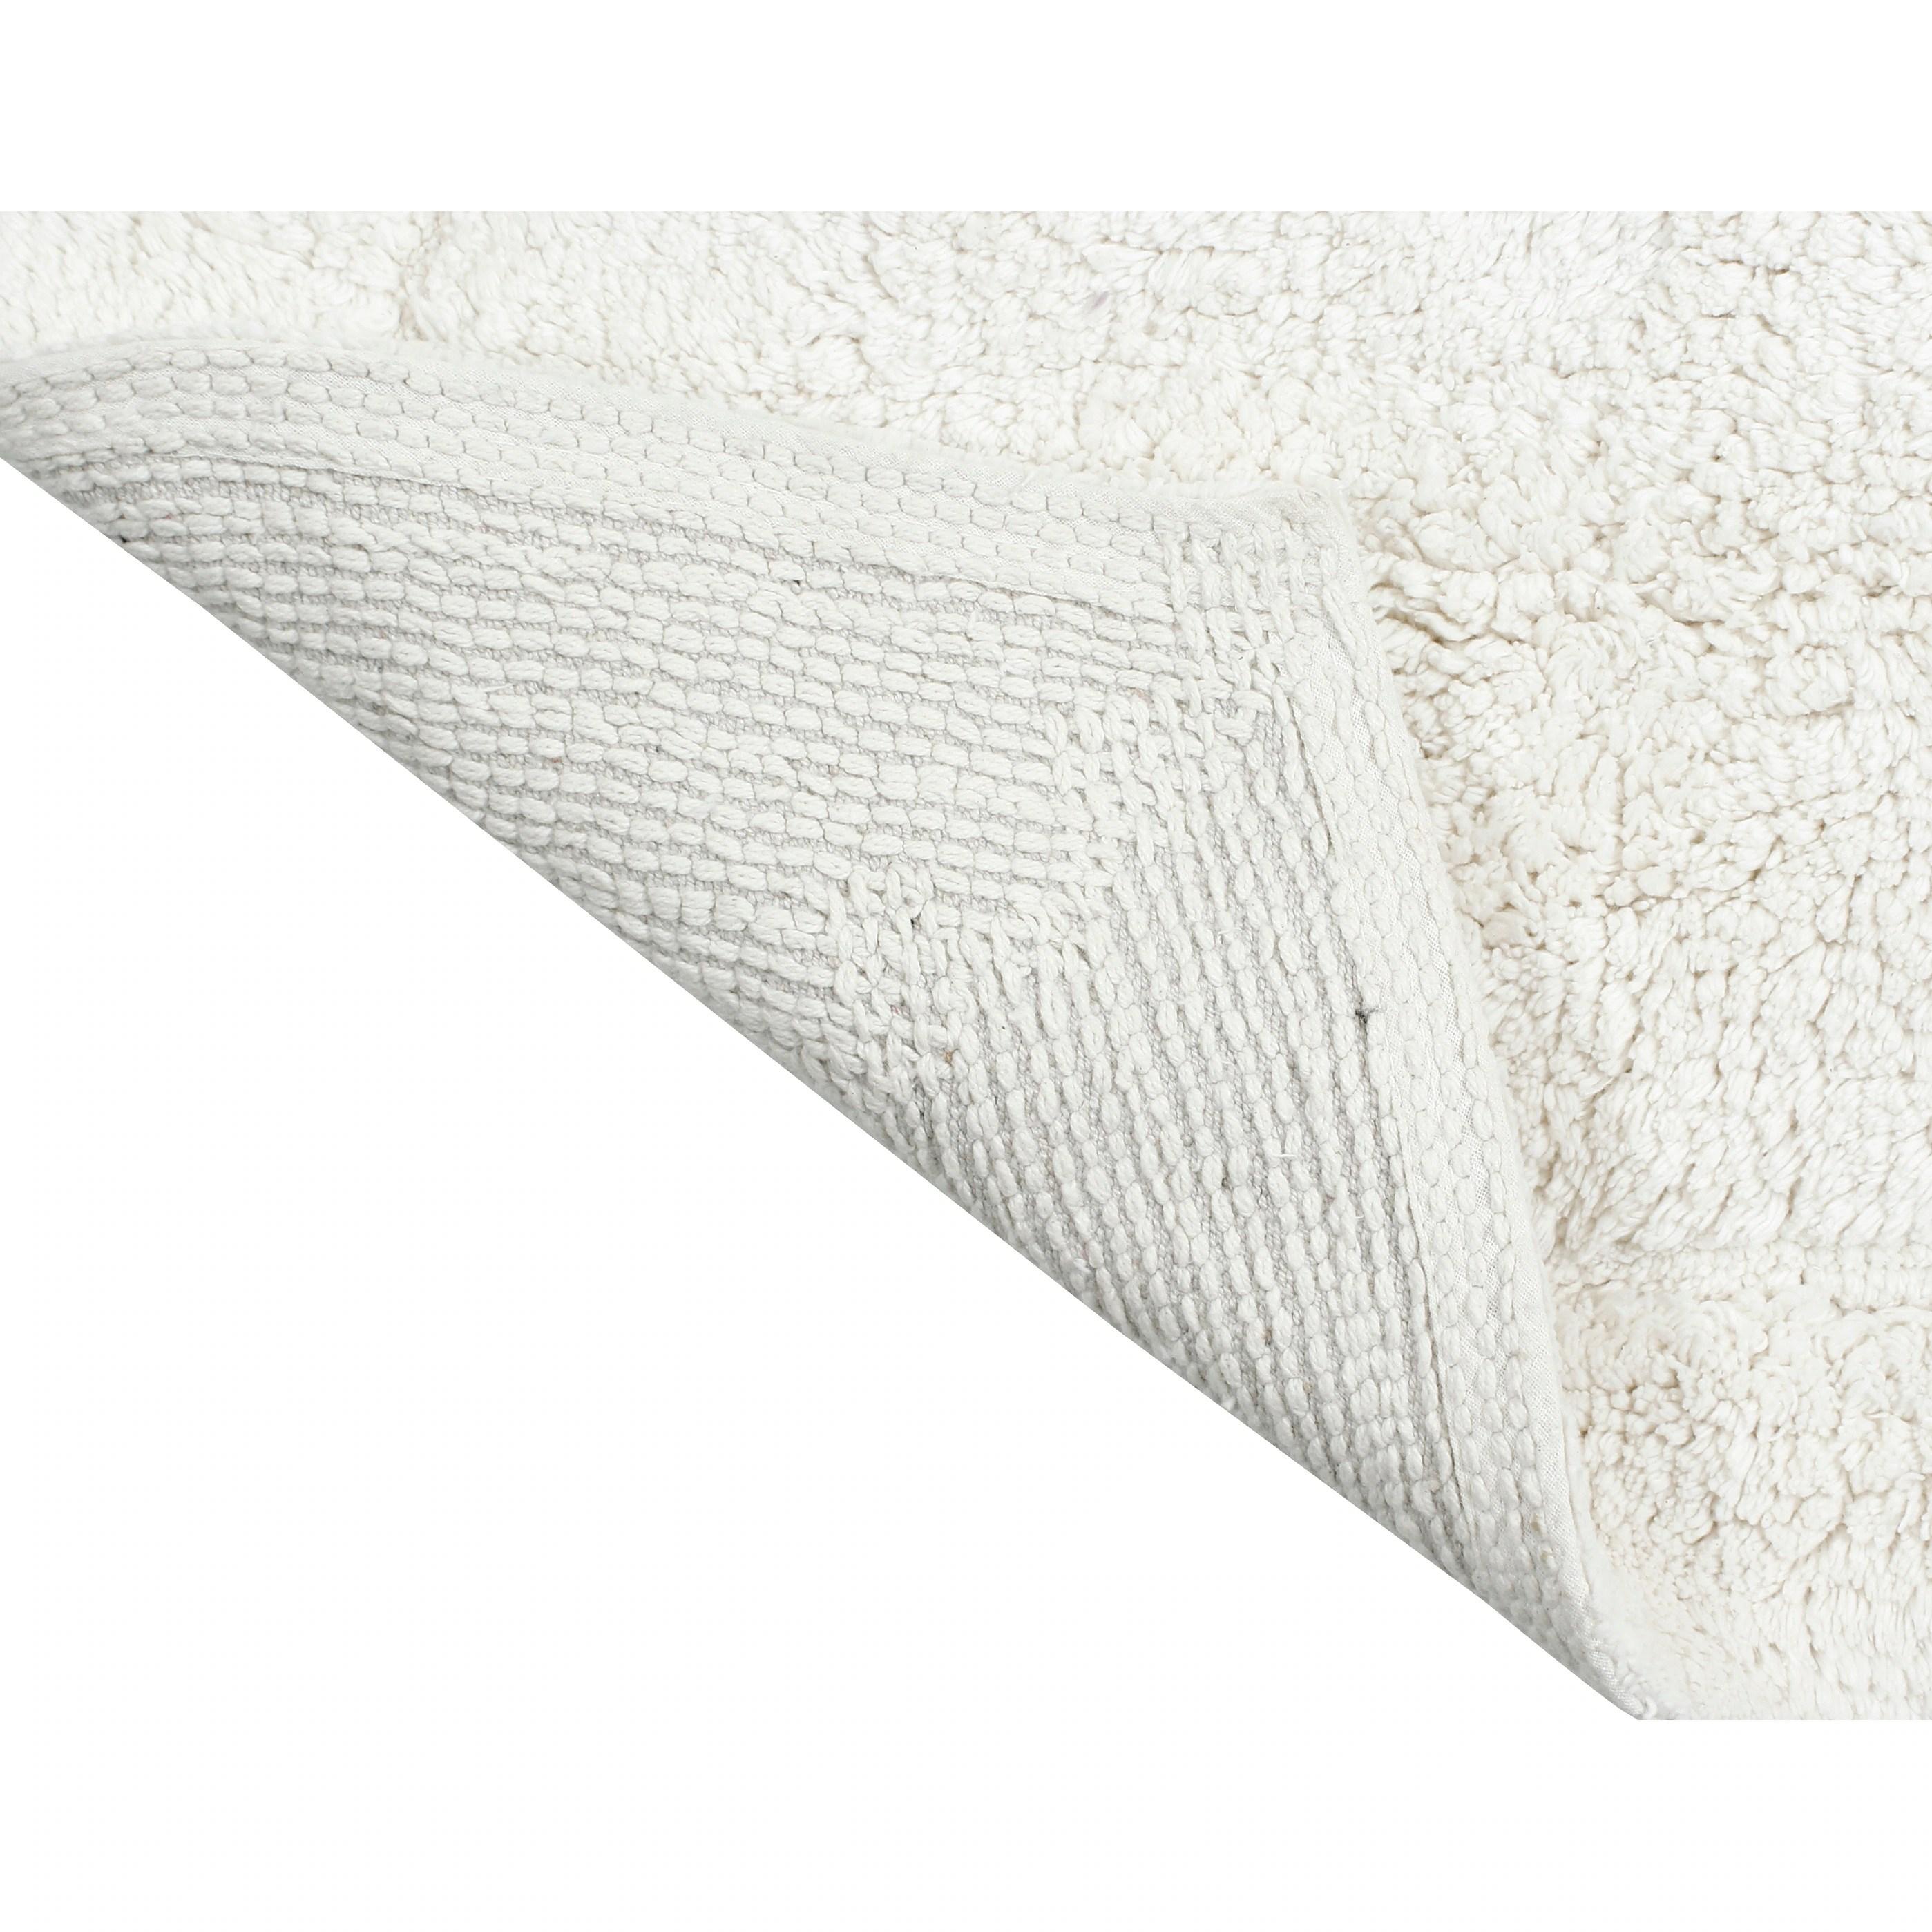 waterford collection genuine absorbent cotton 5 piece set bath rug 17 x24 21 x34 20 x20 22 x60 24 x40